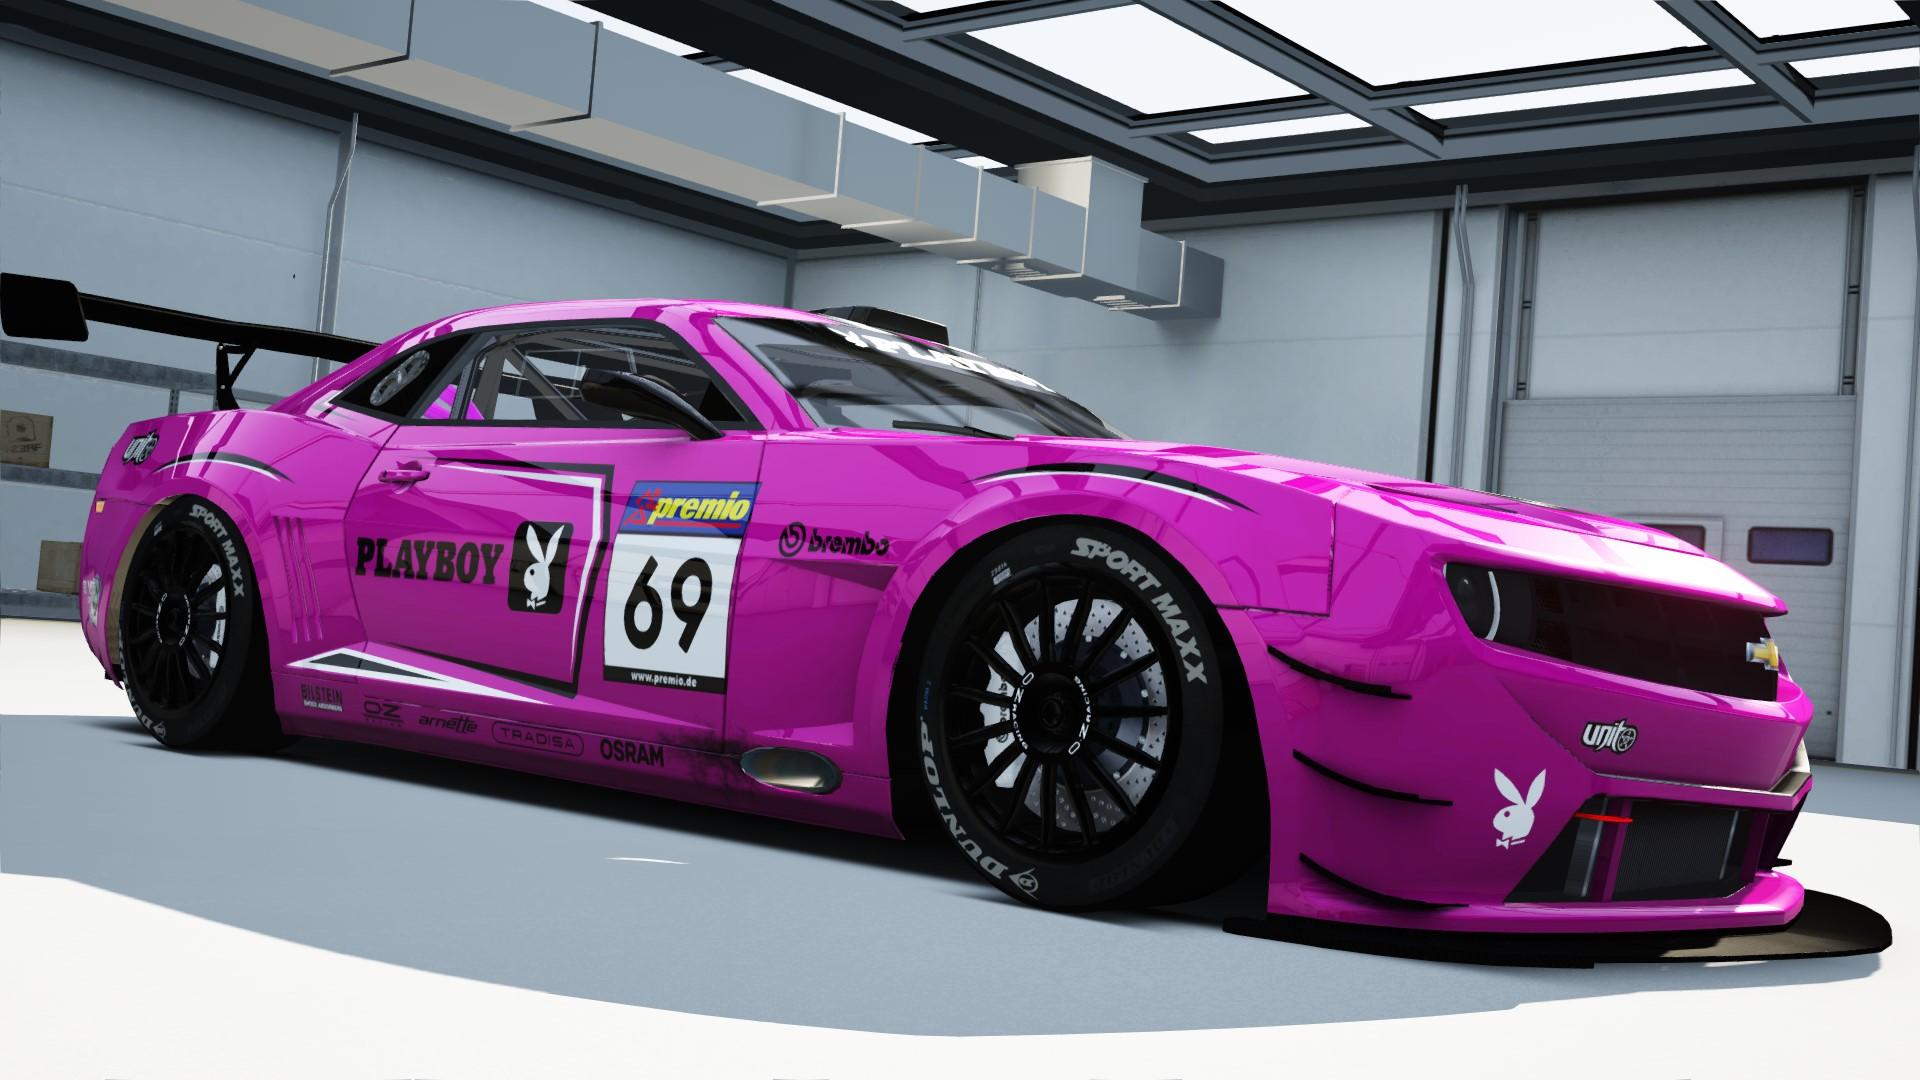 Showroom_sareni_camaro_gt_racecar_6-7-2017-23-54-20.jpg